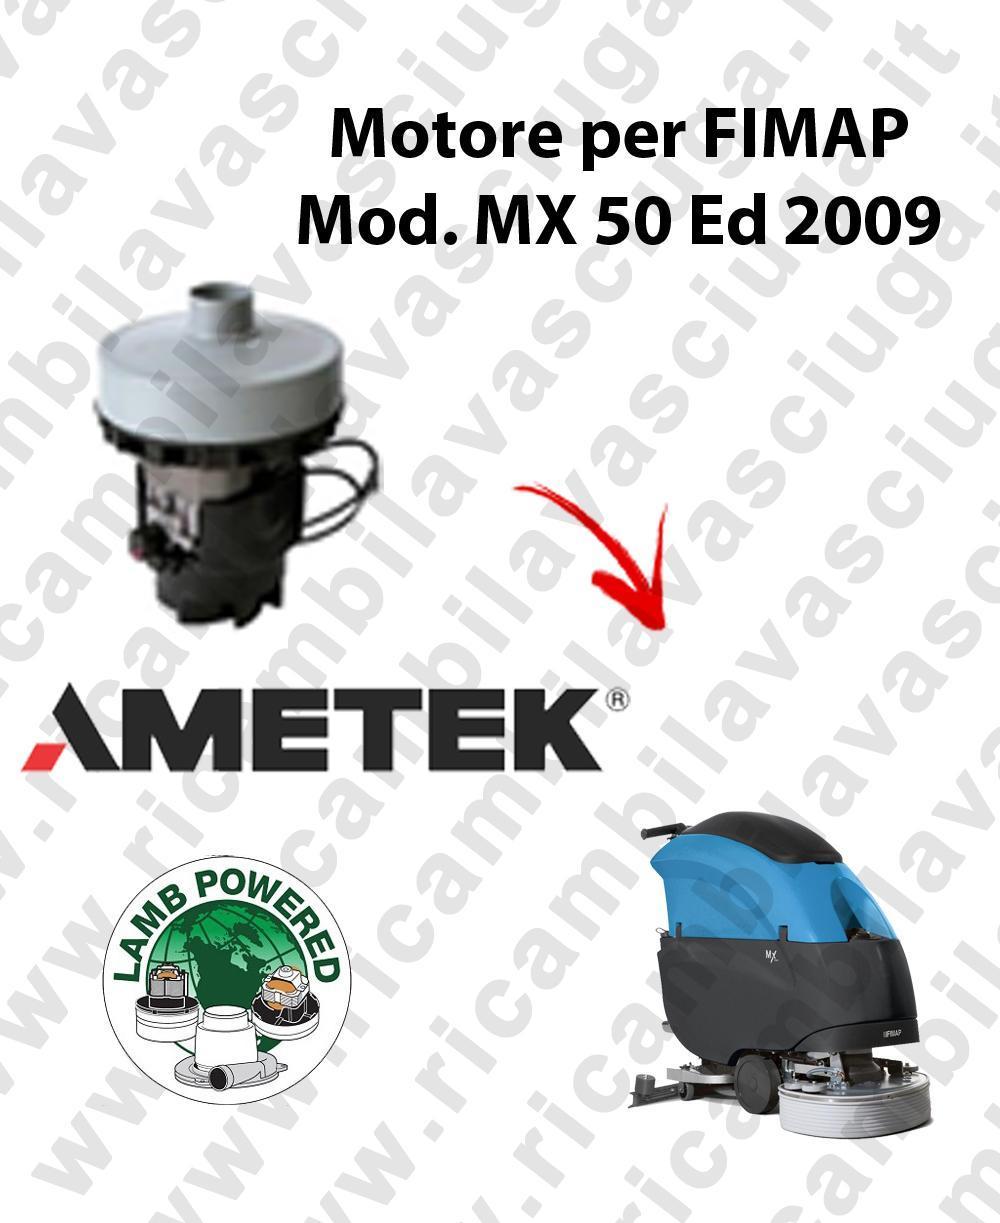 MX 50 Ed. 2009 Saugmotor LAMB AMETEK für scheuersaugmaschinen FIMAP